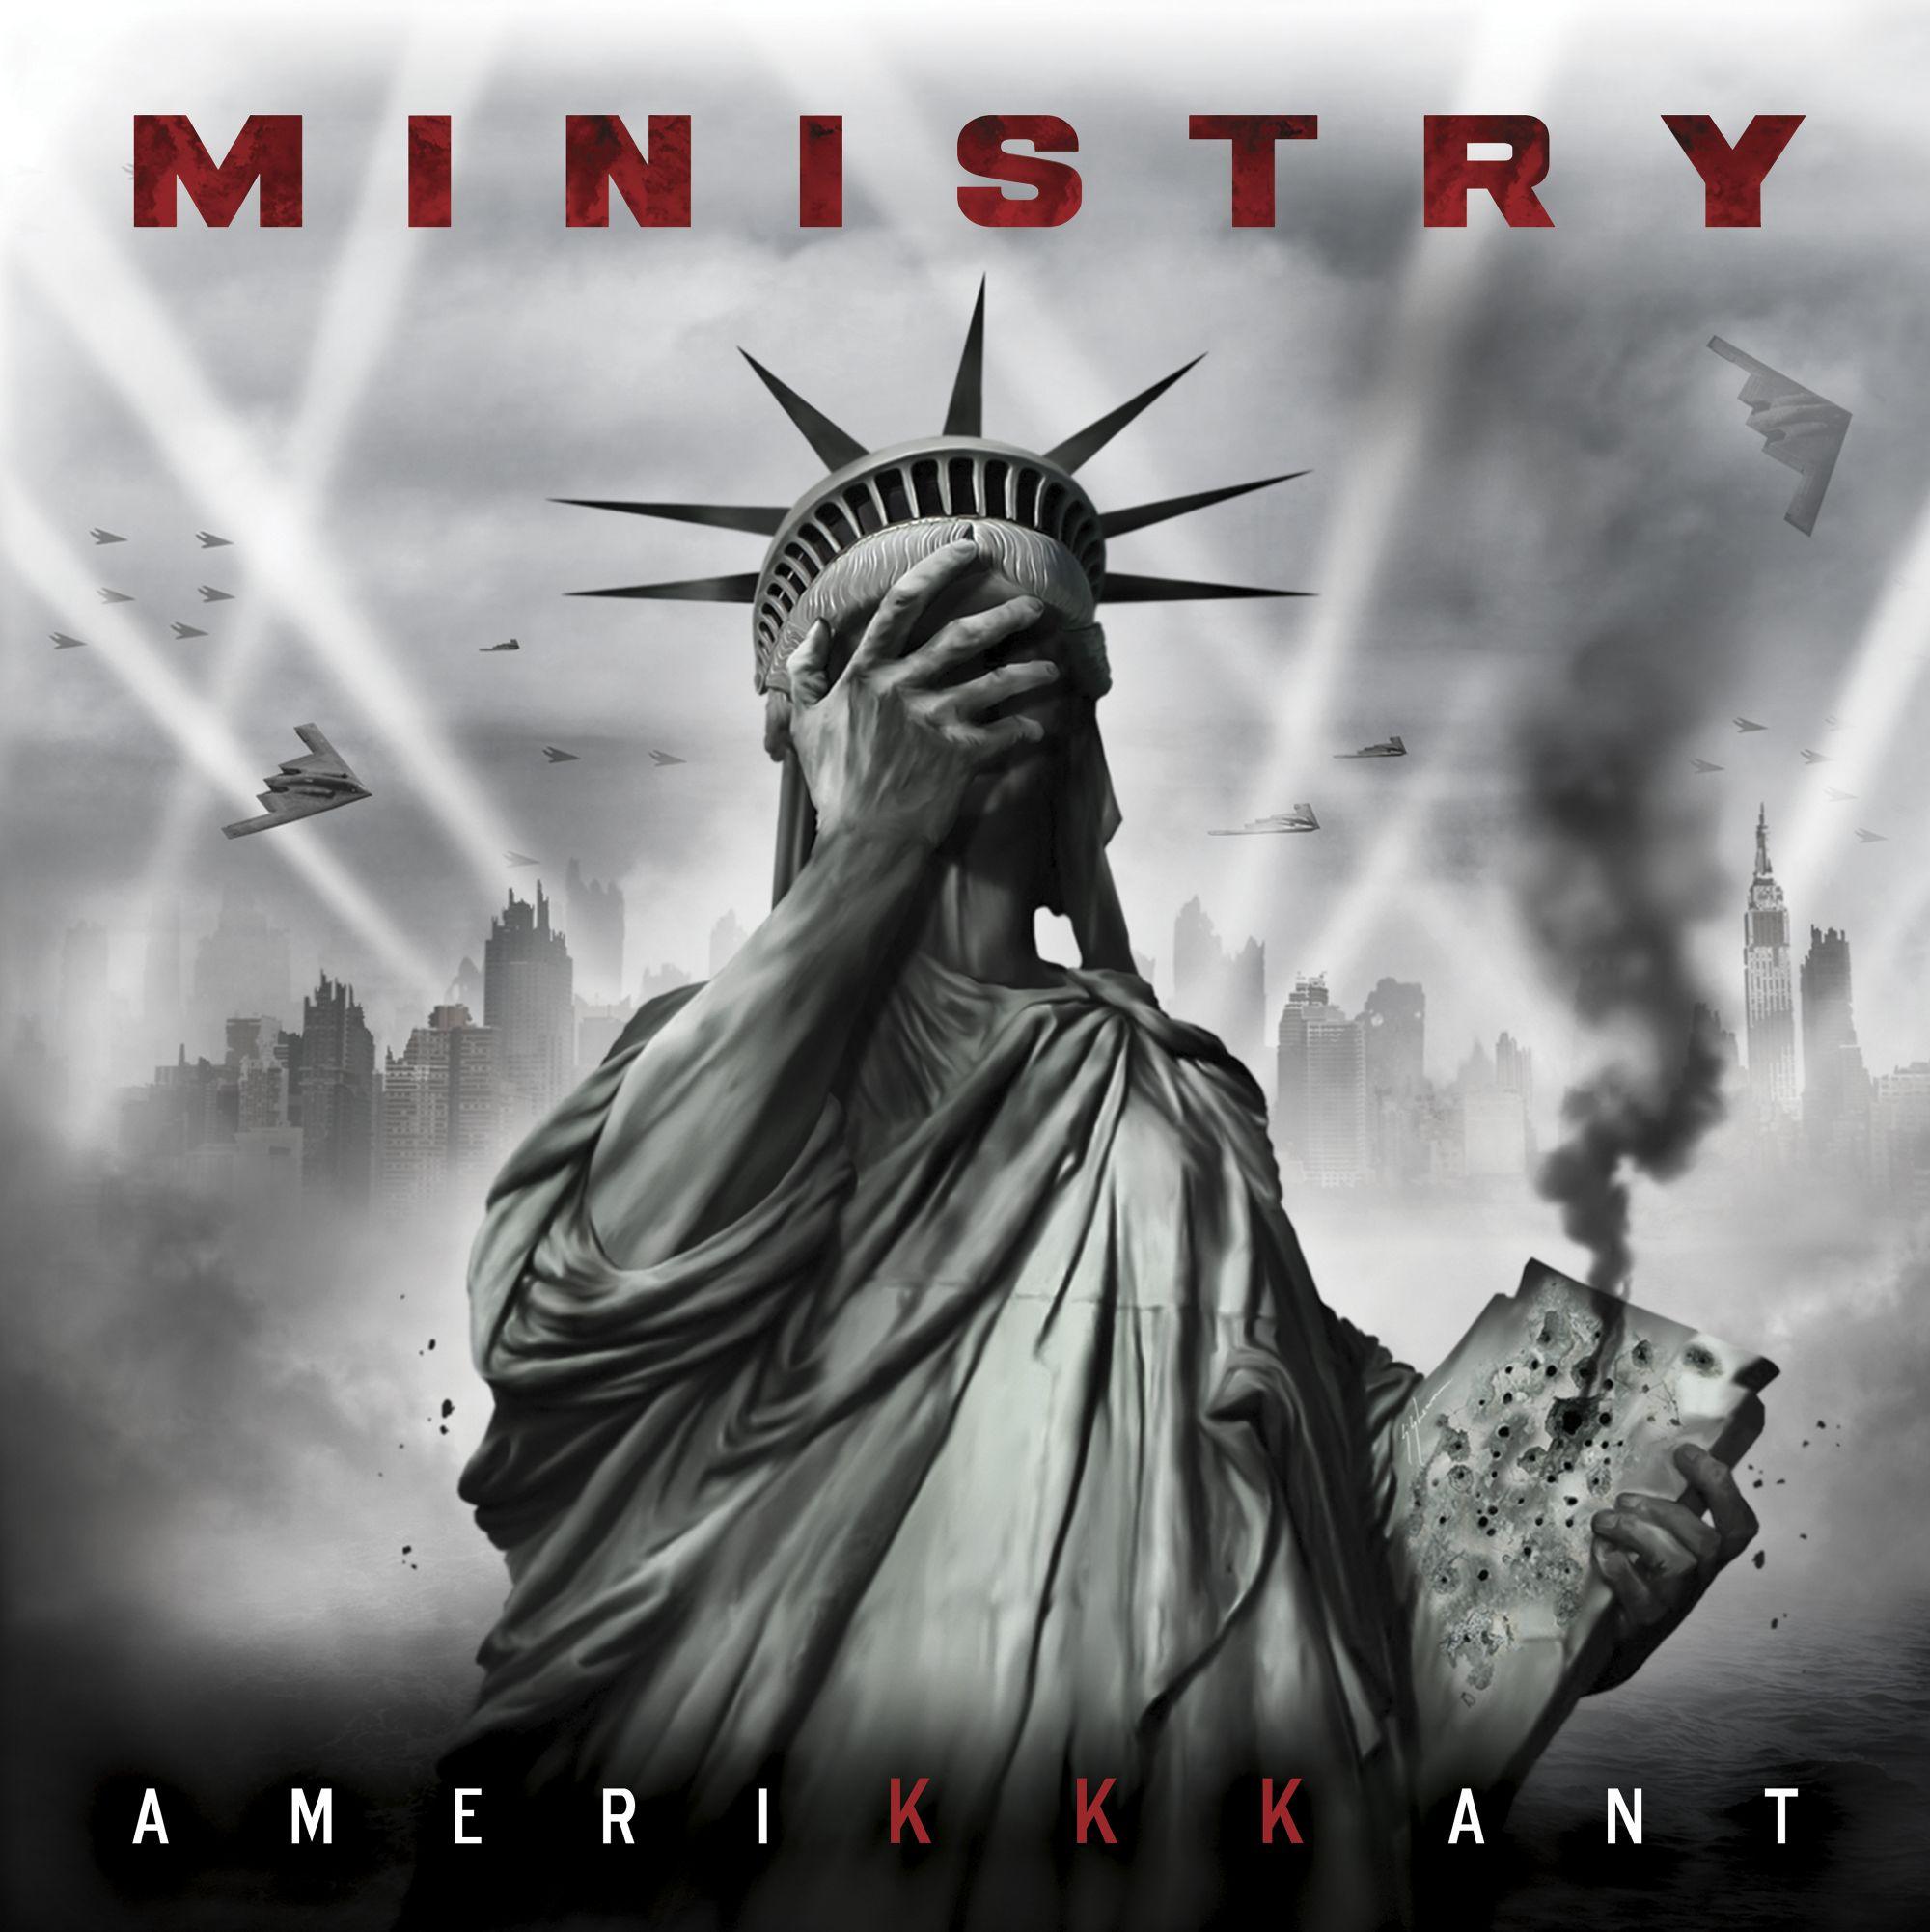 Ministry - Amerikkkant_4000px